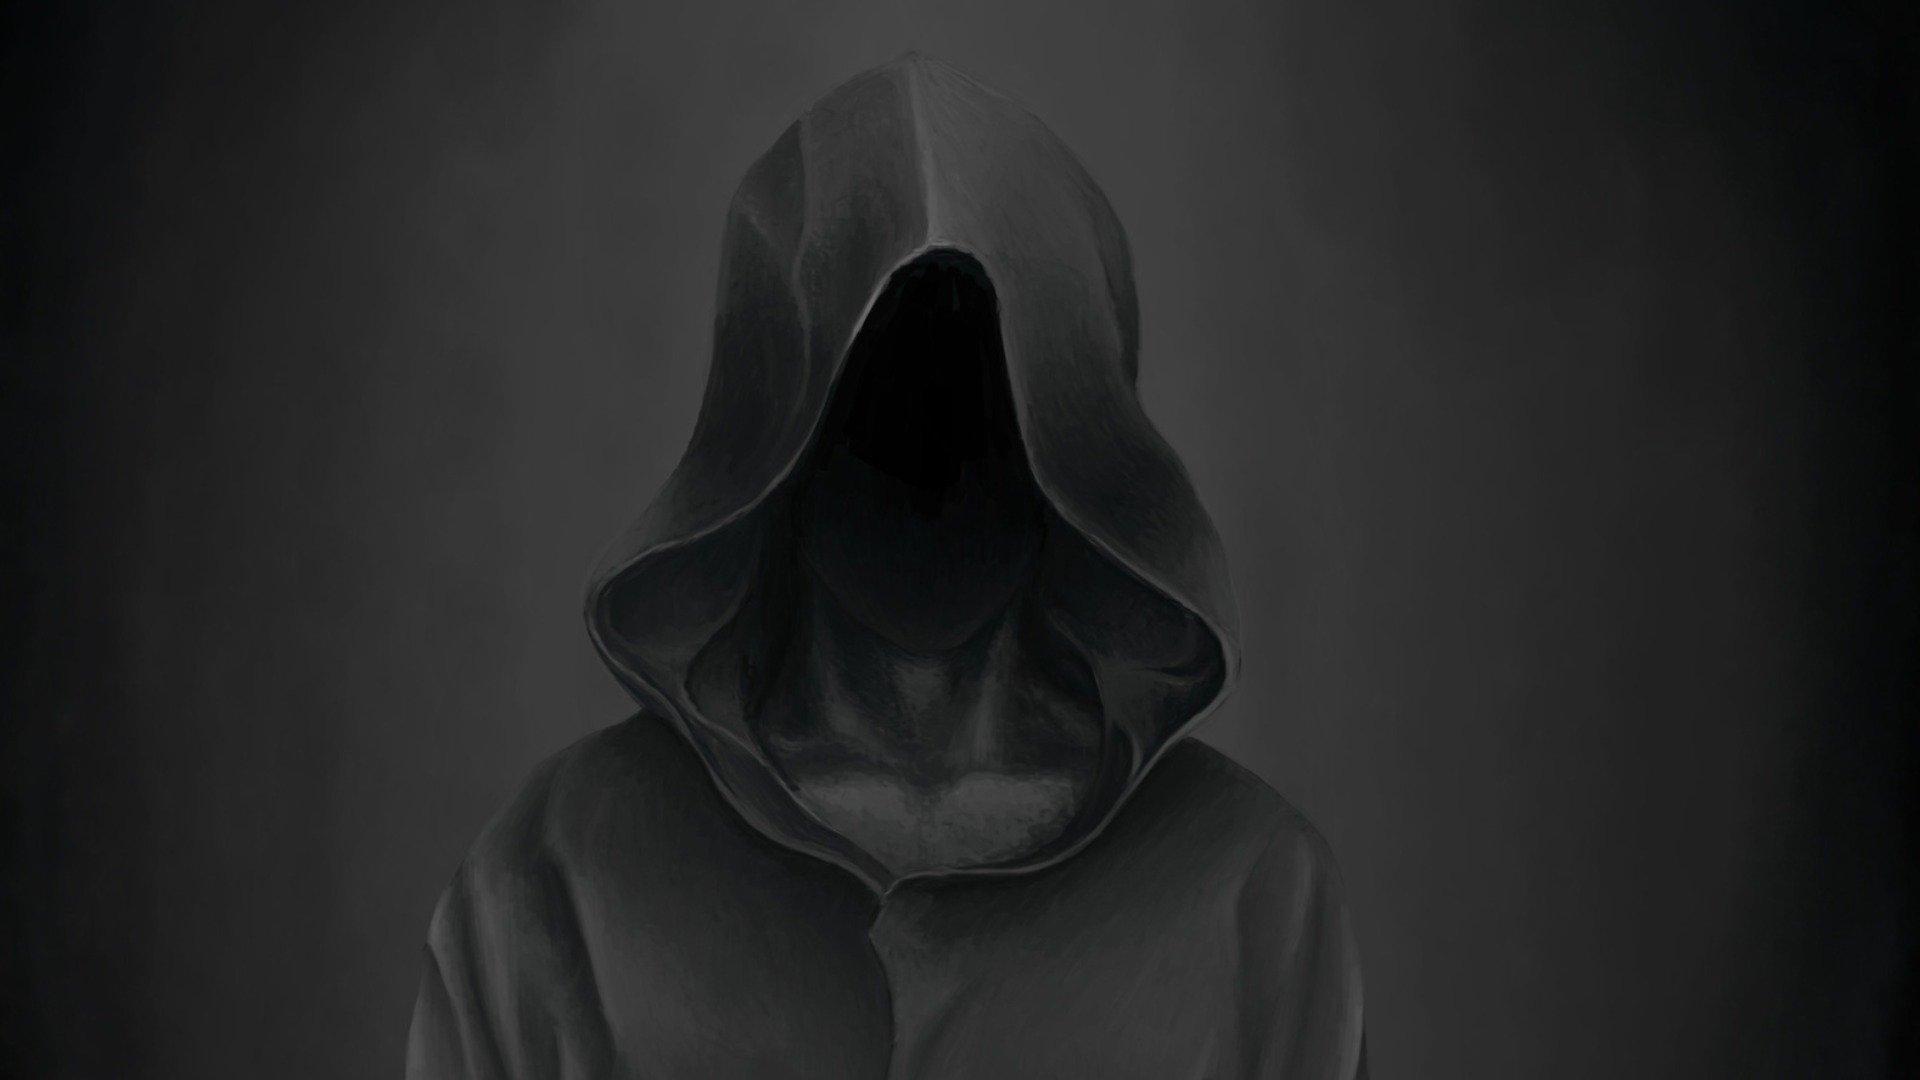 рабыни картинки мрак на аву должен